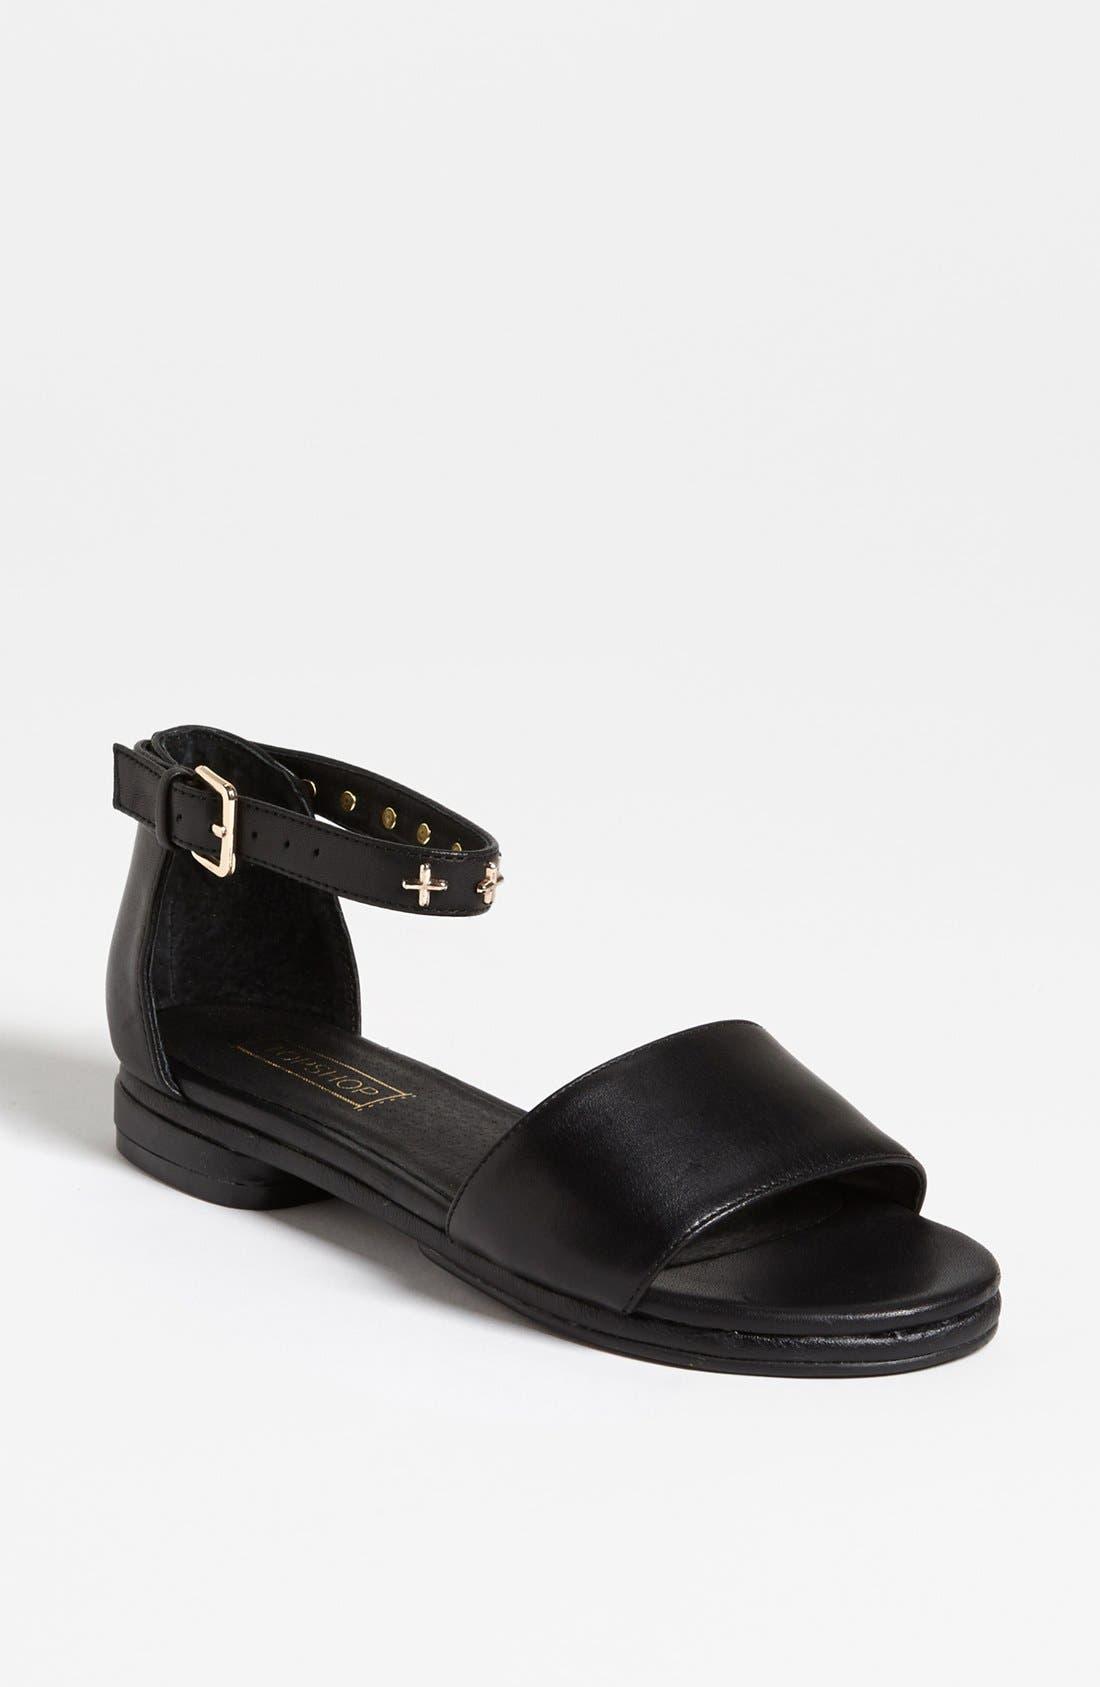 Main Image - Topshop 'Fend' Sandal